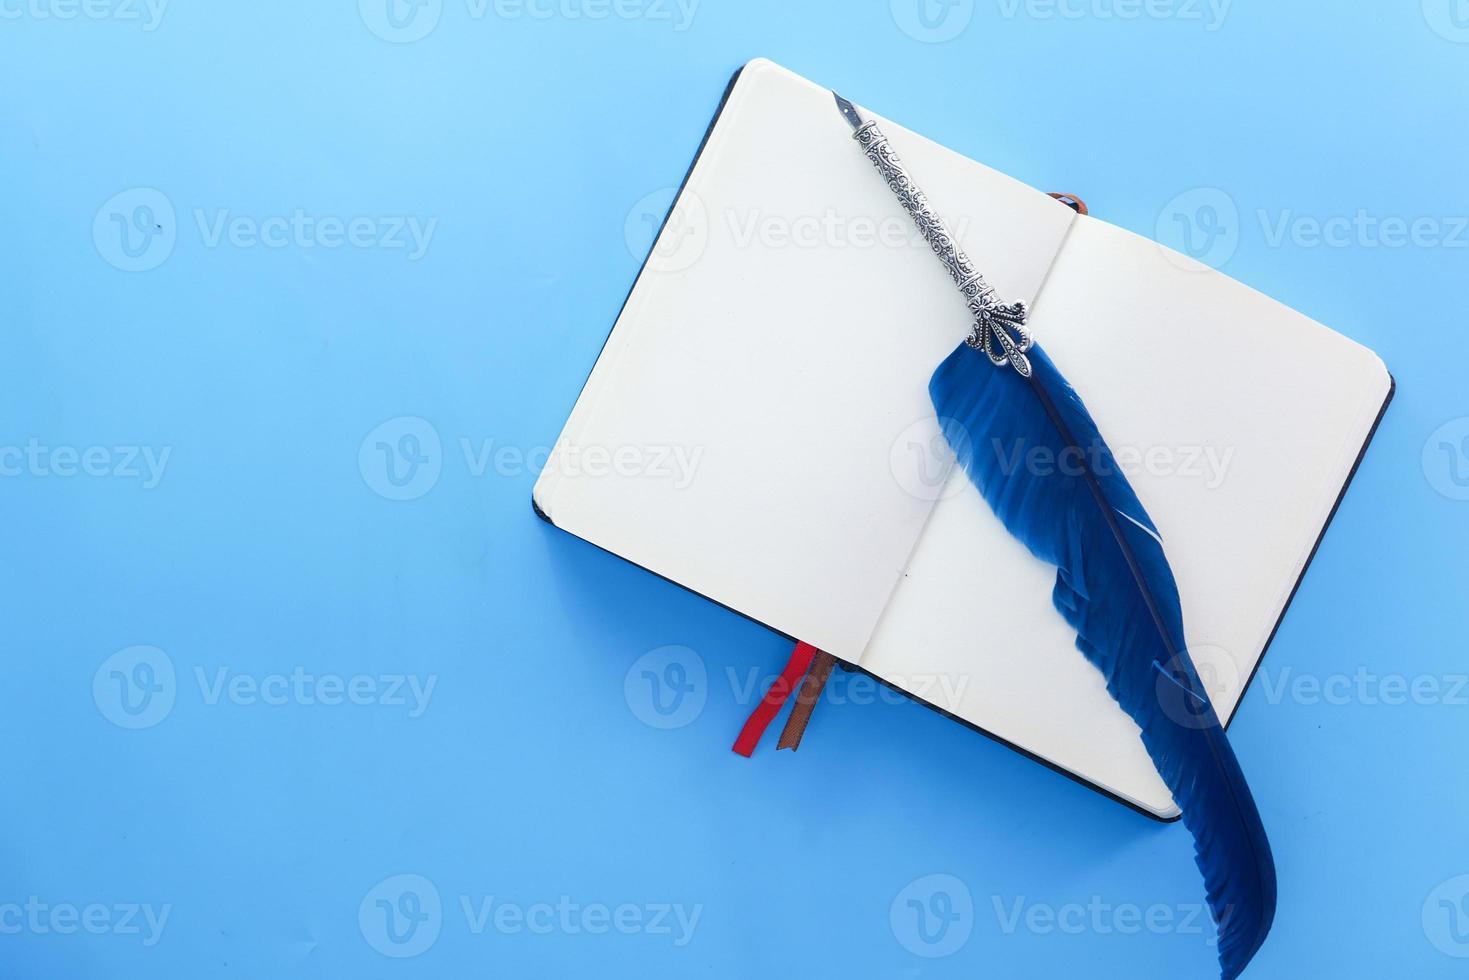 open boek en oude vulpen op blauwe achtergrond foto